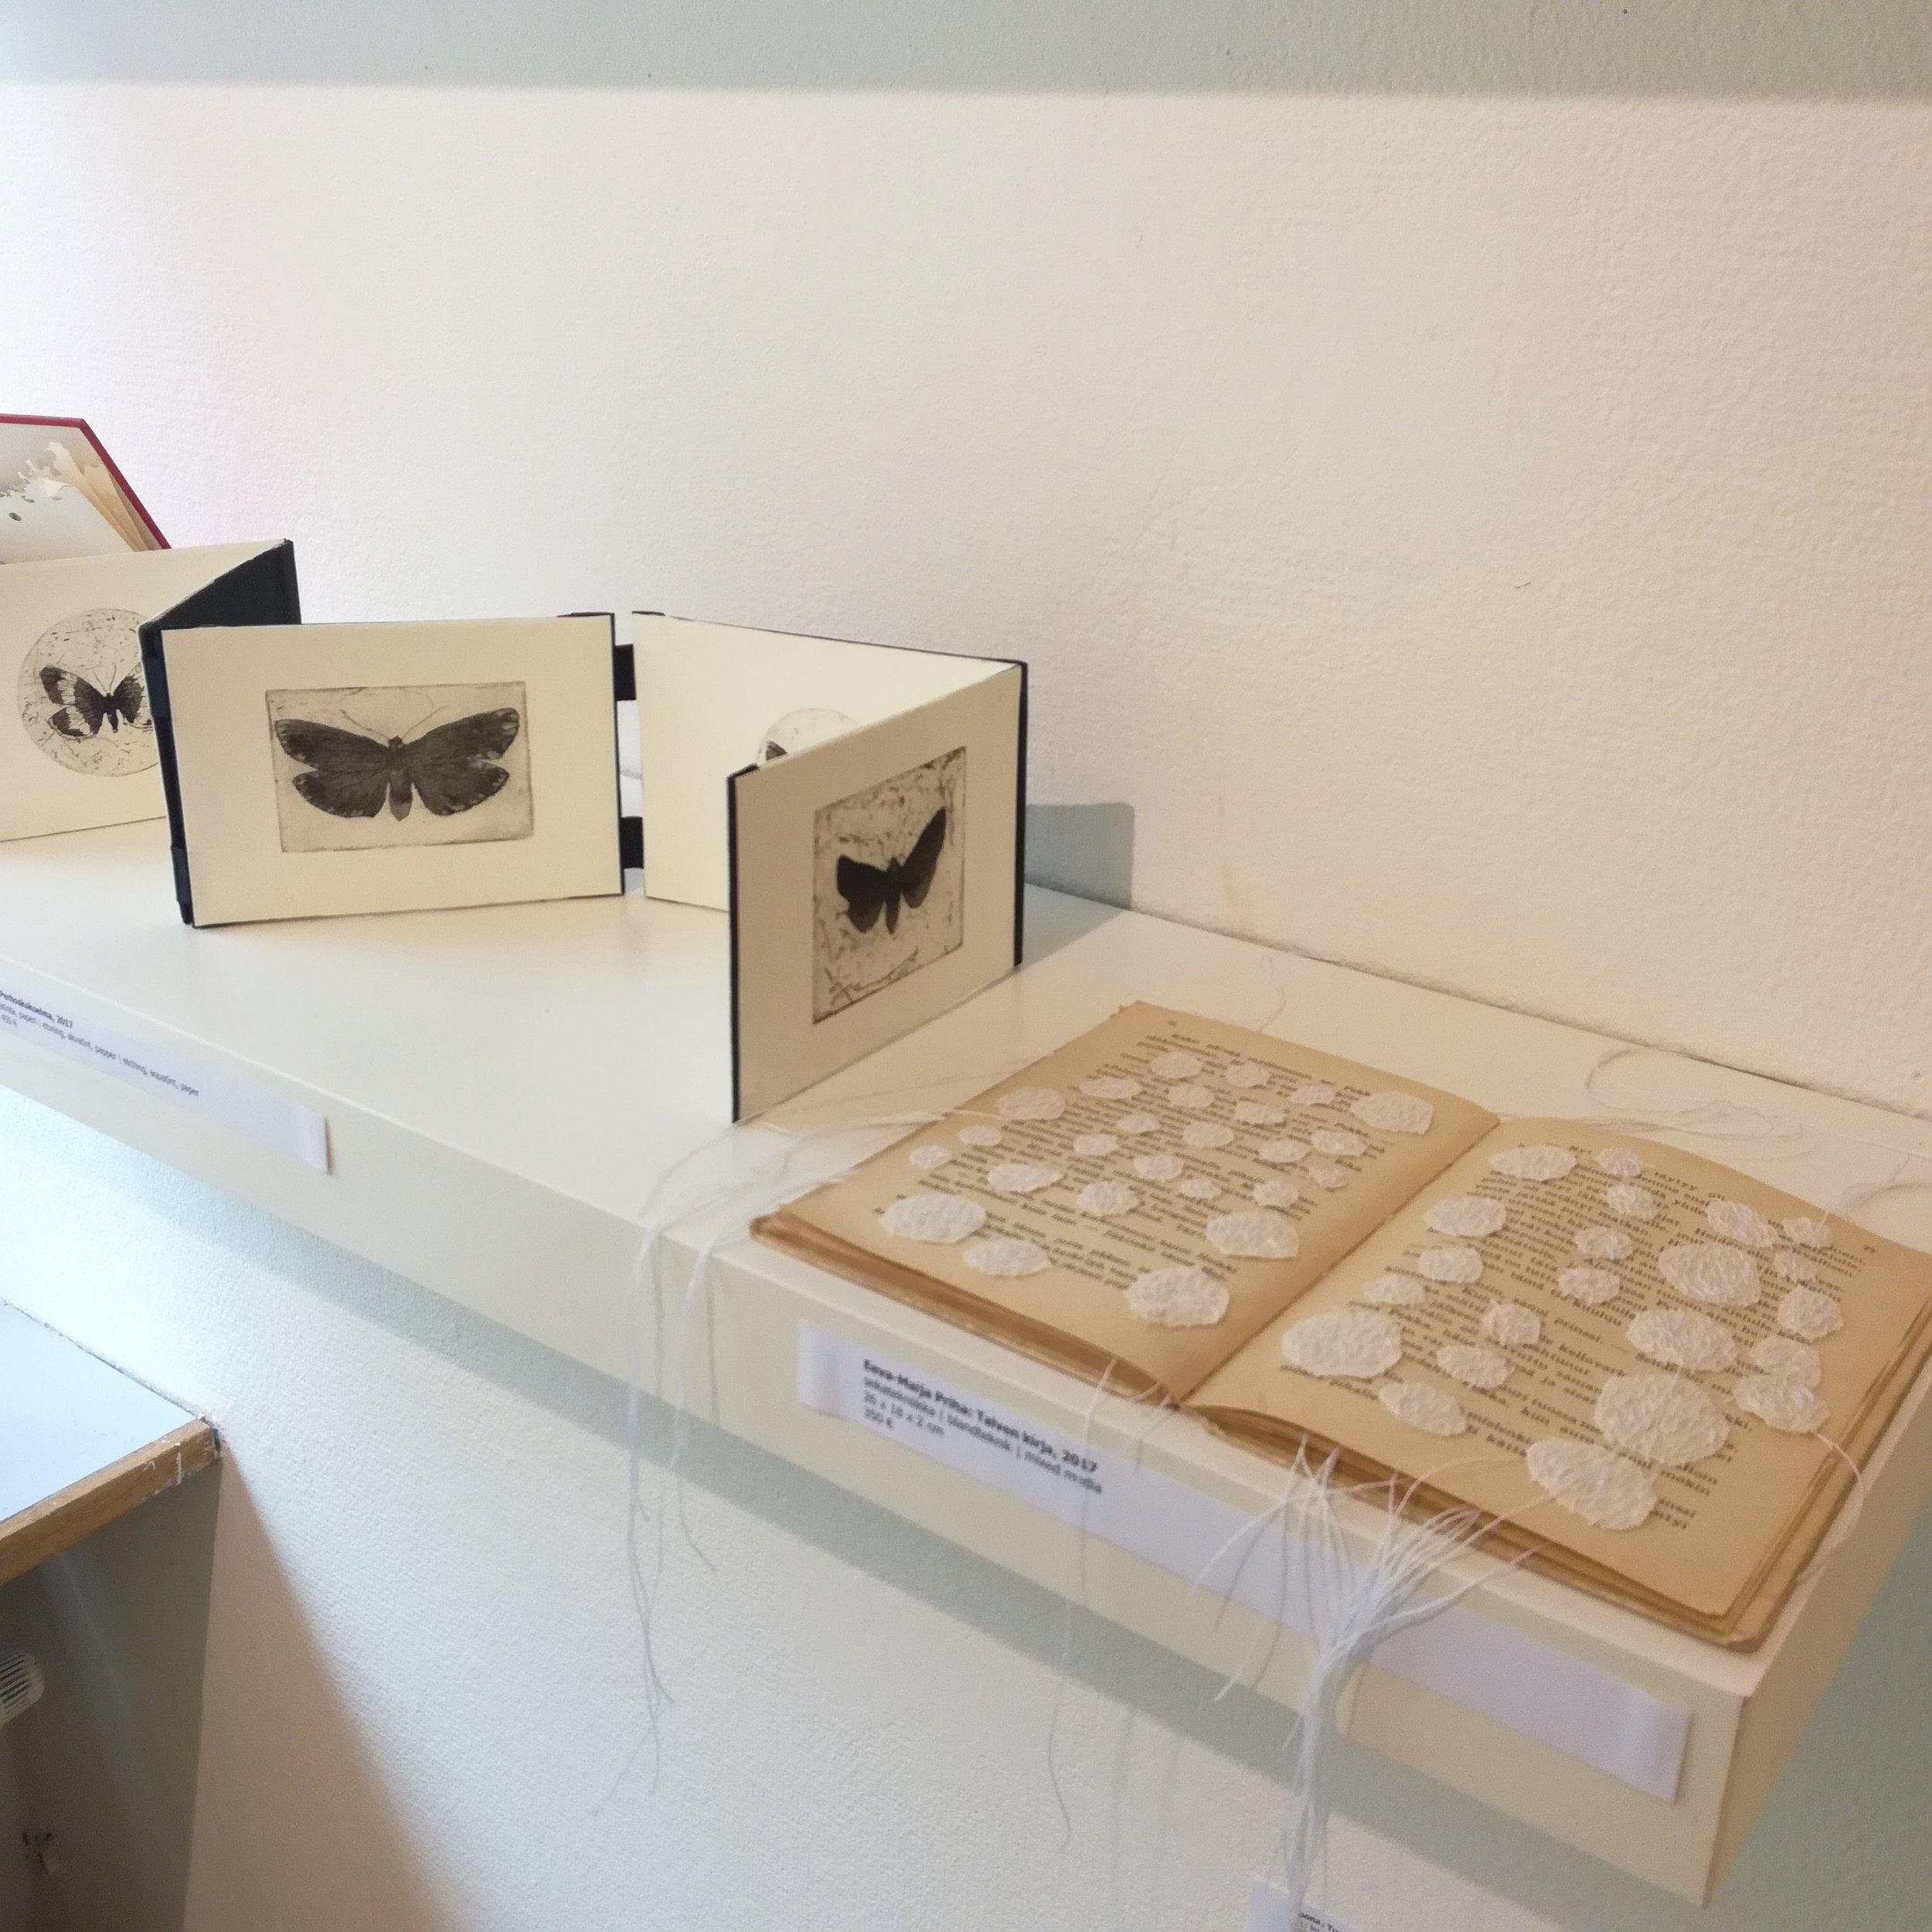 Perhoskokoelma, 2017, by Katja Taskinen etching, aquatint, papet - 10x13,5/71cm  Talven kirja, 2017, by Eeva-Maija Priha 26x18x2cm